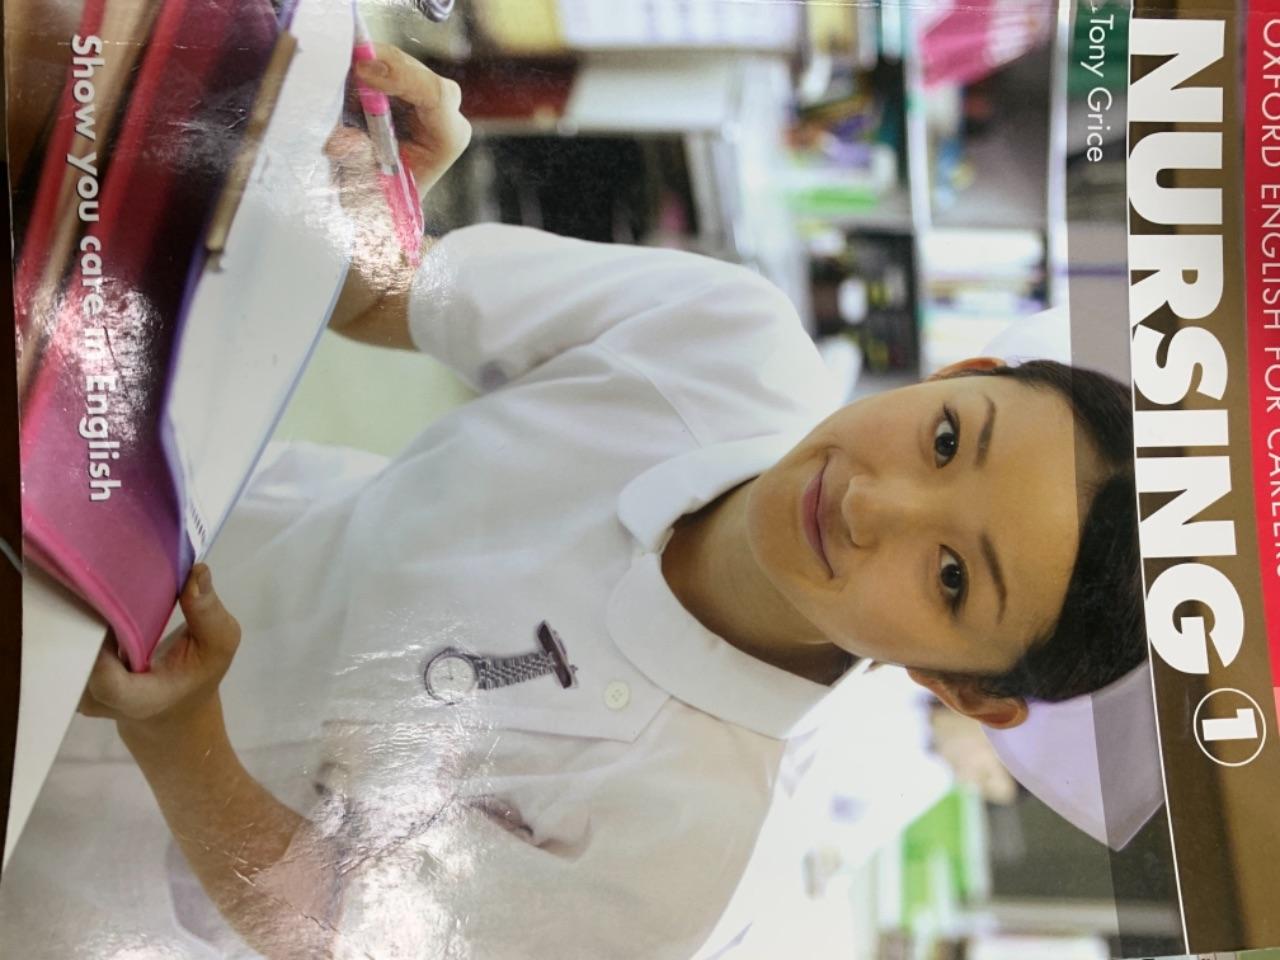 Development Of Nursing Uniform - Anal Mom Pics